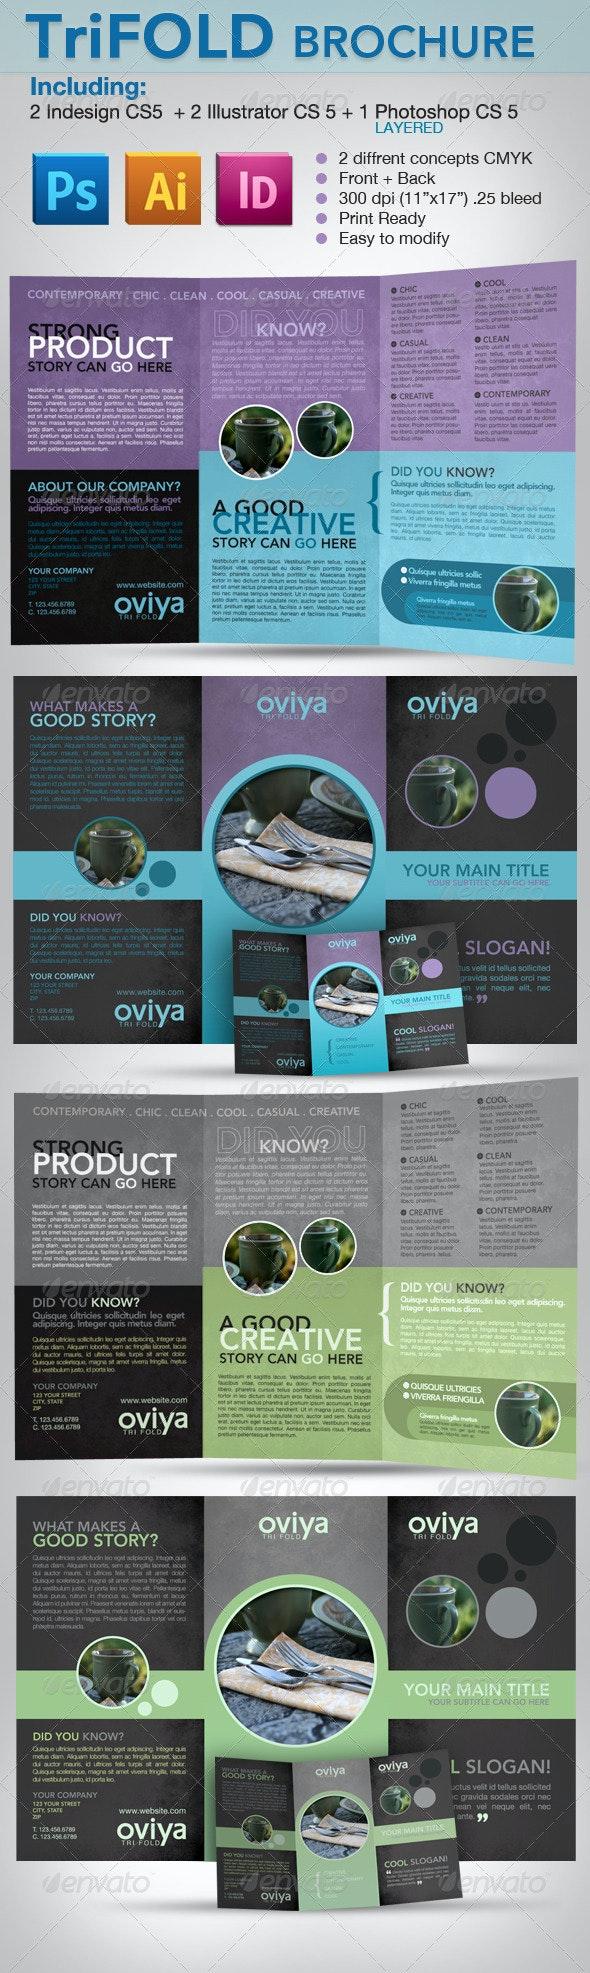 Trifold Brochure - Indesign, Illustrator & photosh - Corporate Brochures